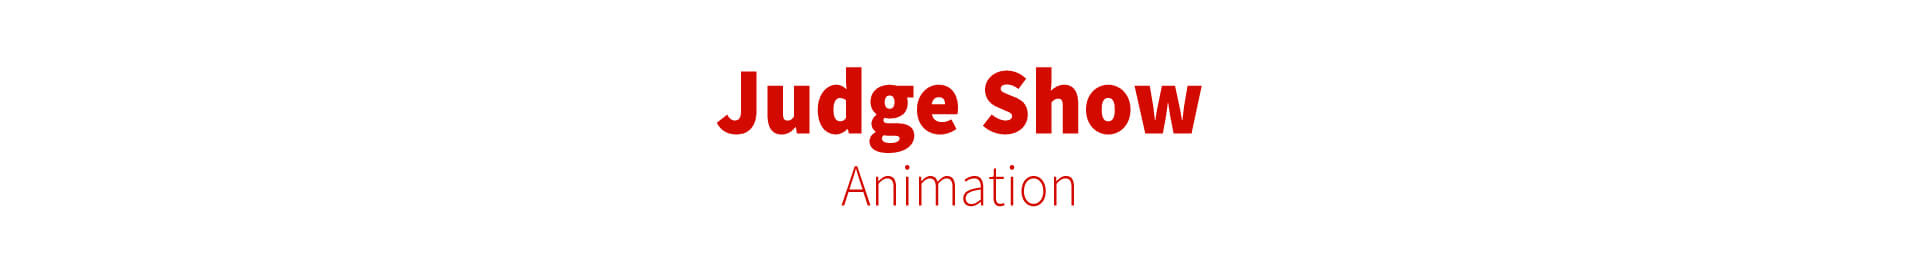 judge show